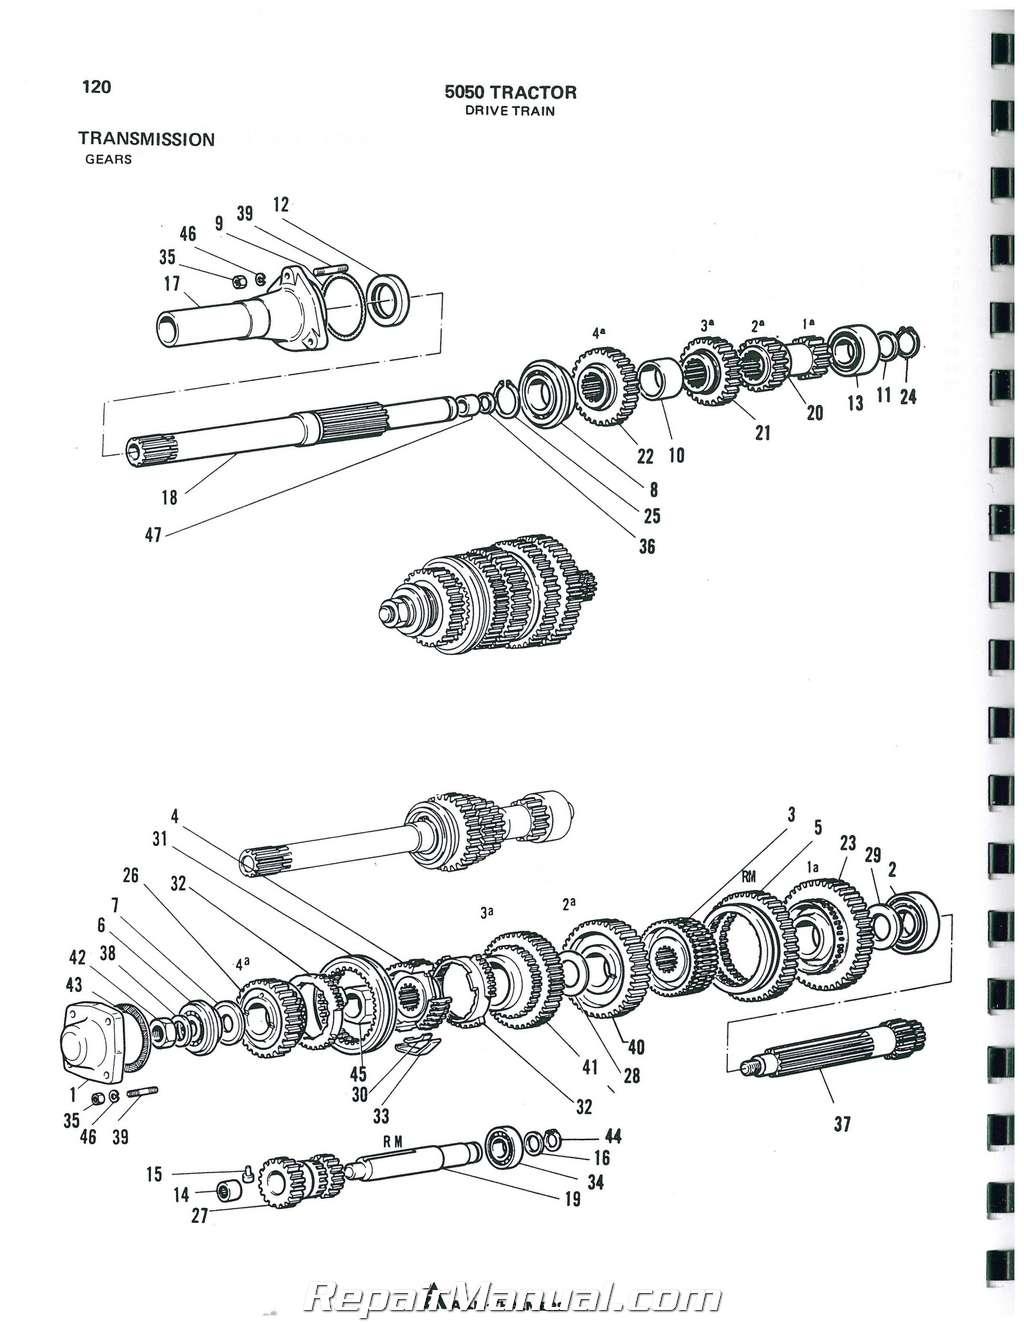 Allis Chalmers 5050 Parts Manual